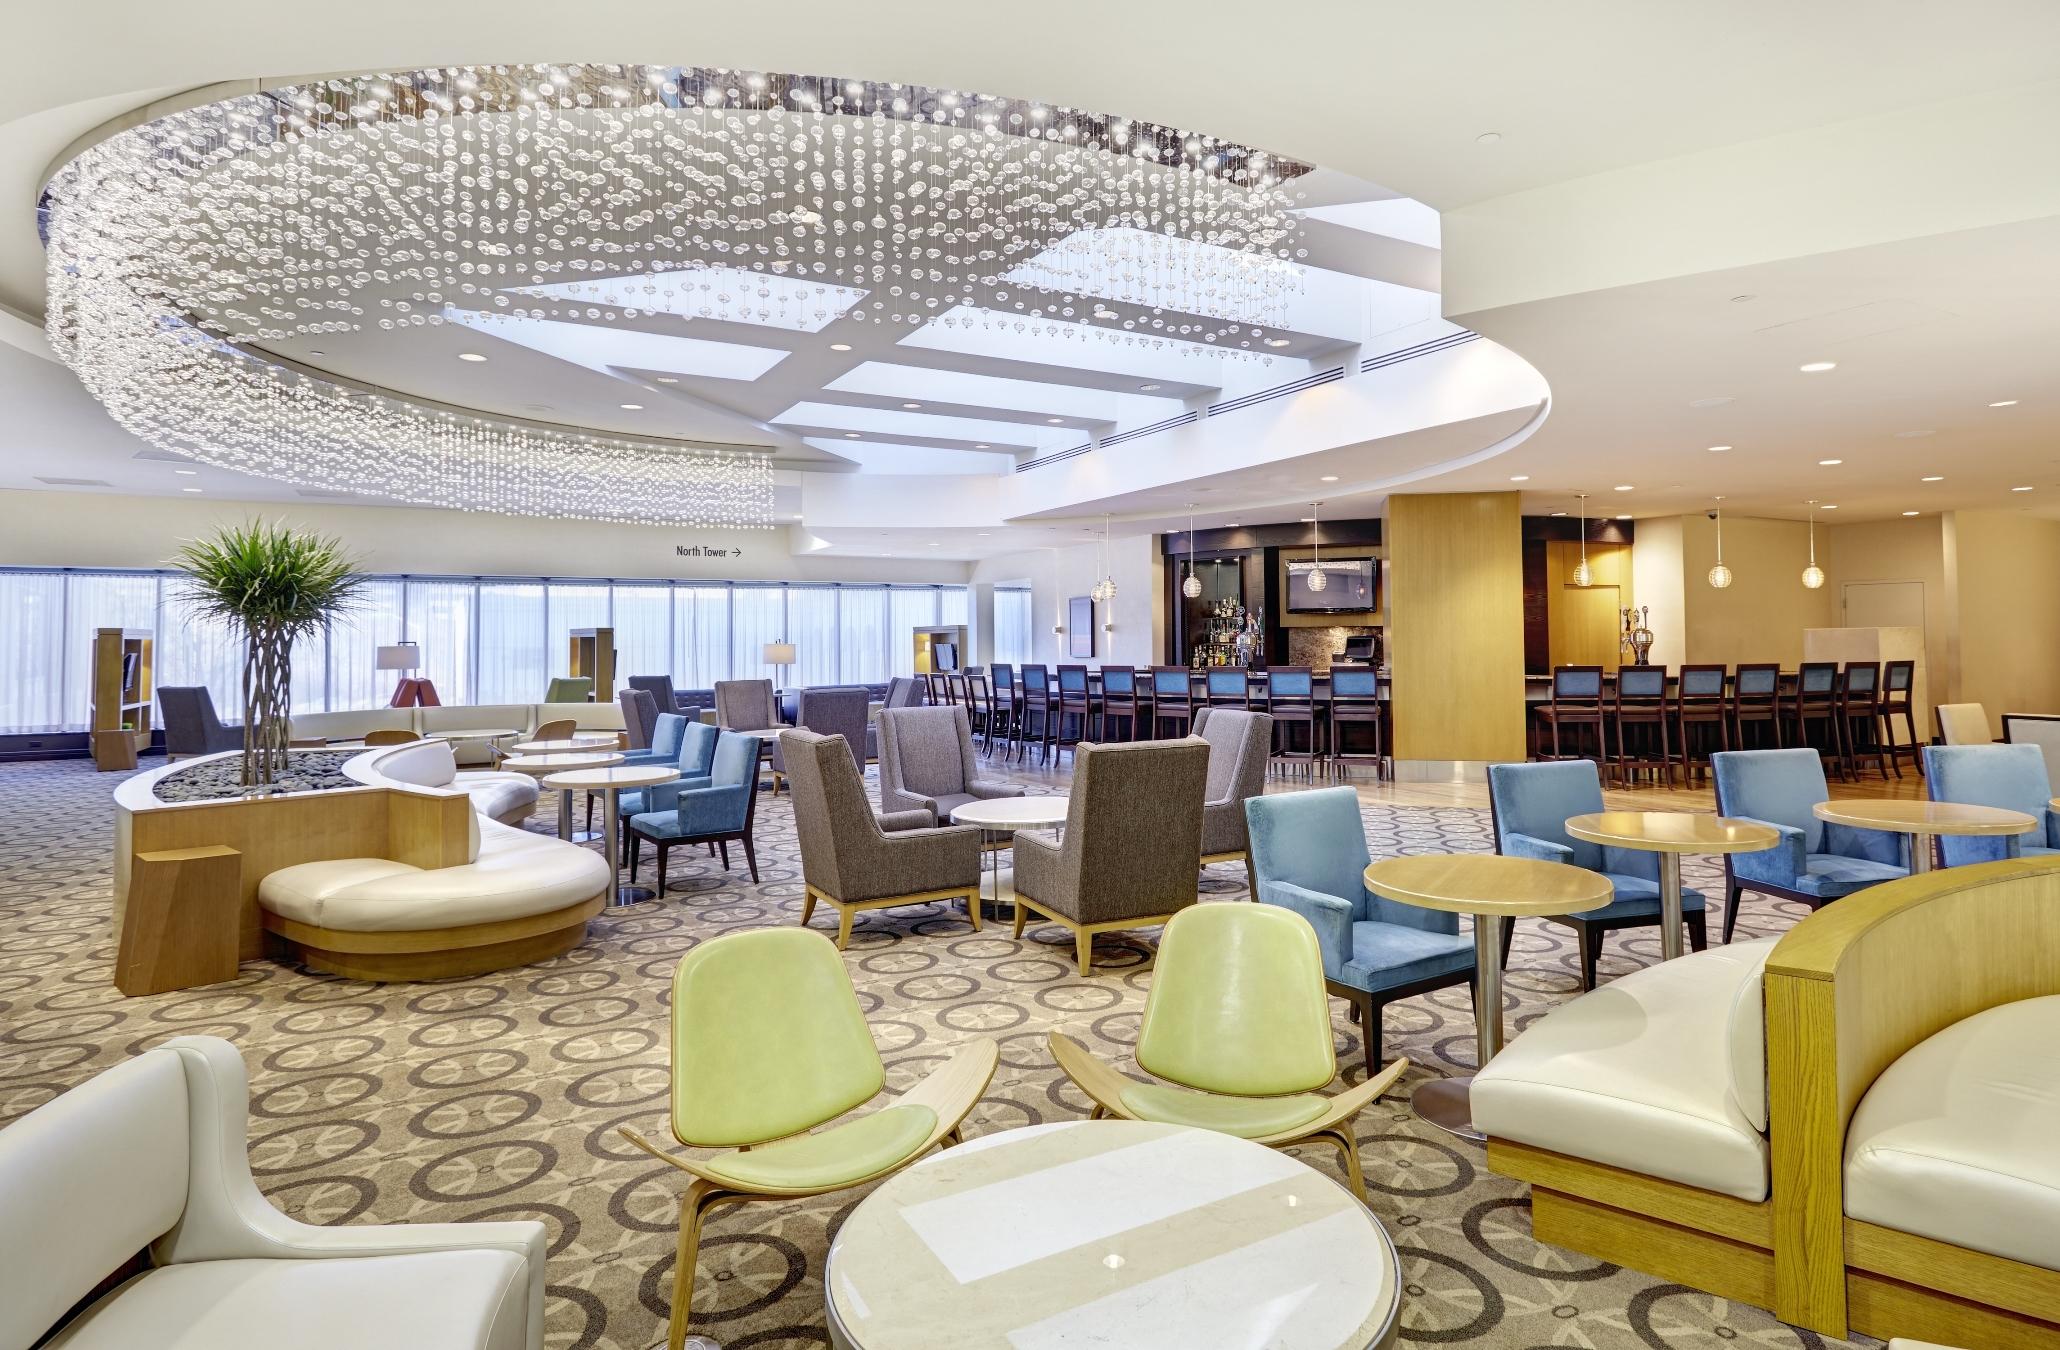 Doubletree by hilton hotel washington dc crystal city in for Design hotel washington dc